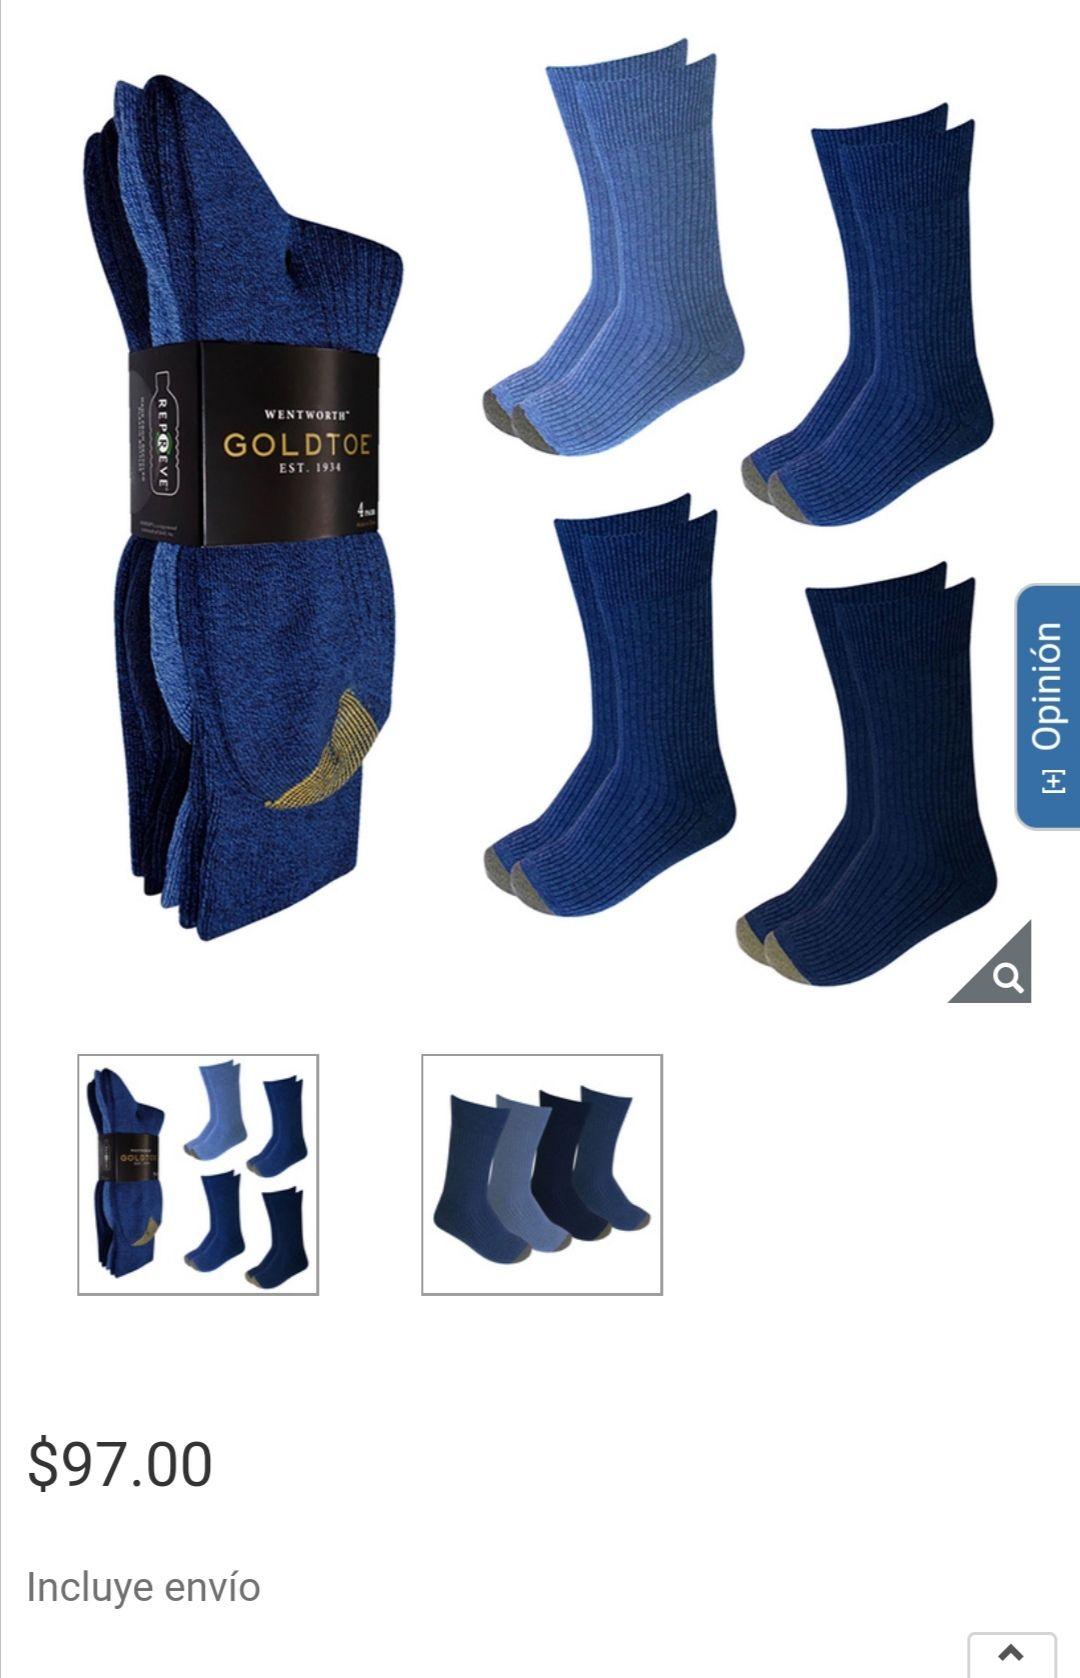 Costco - Gold Toe, Calcetines para Caballero, Azul